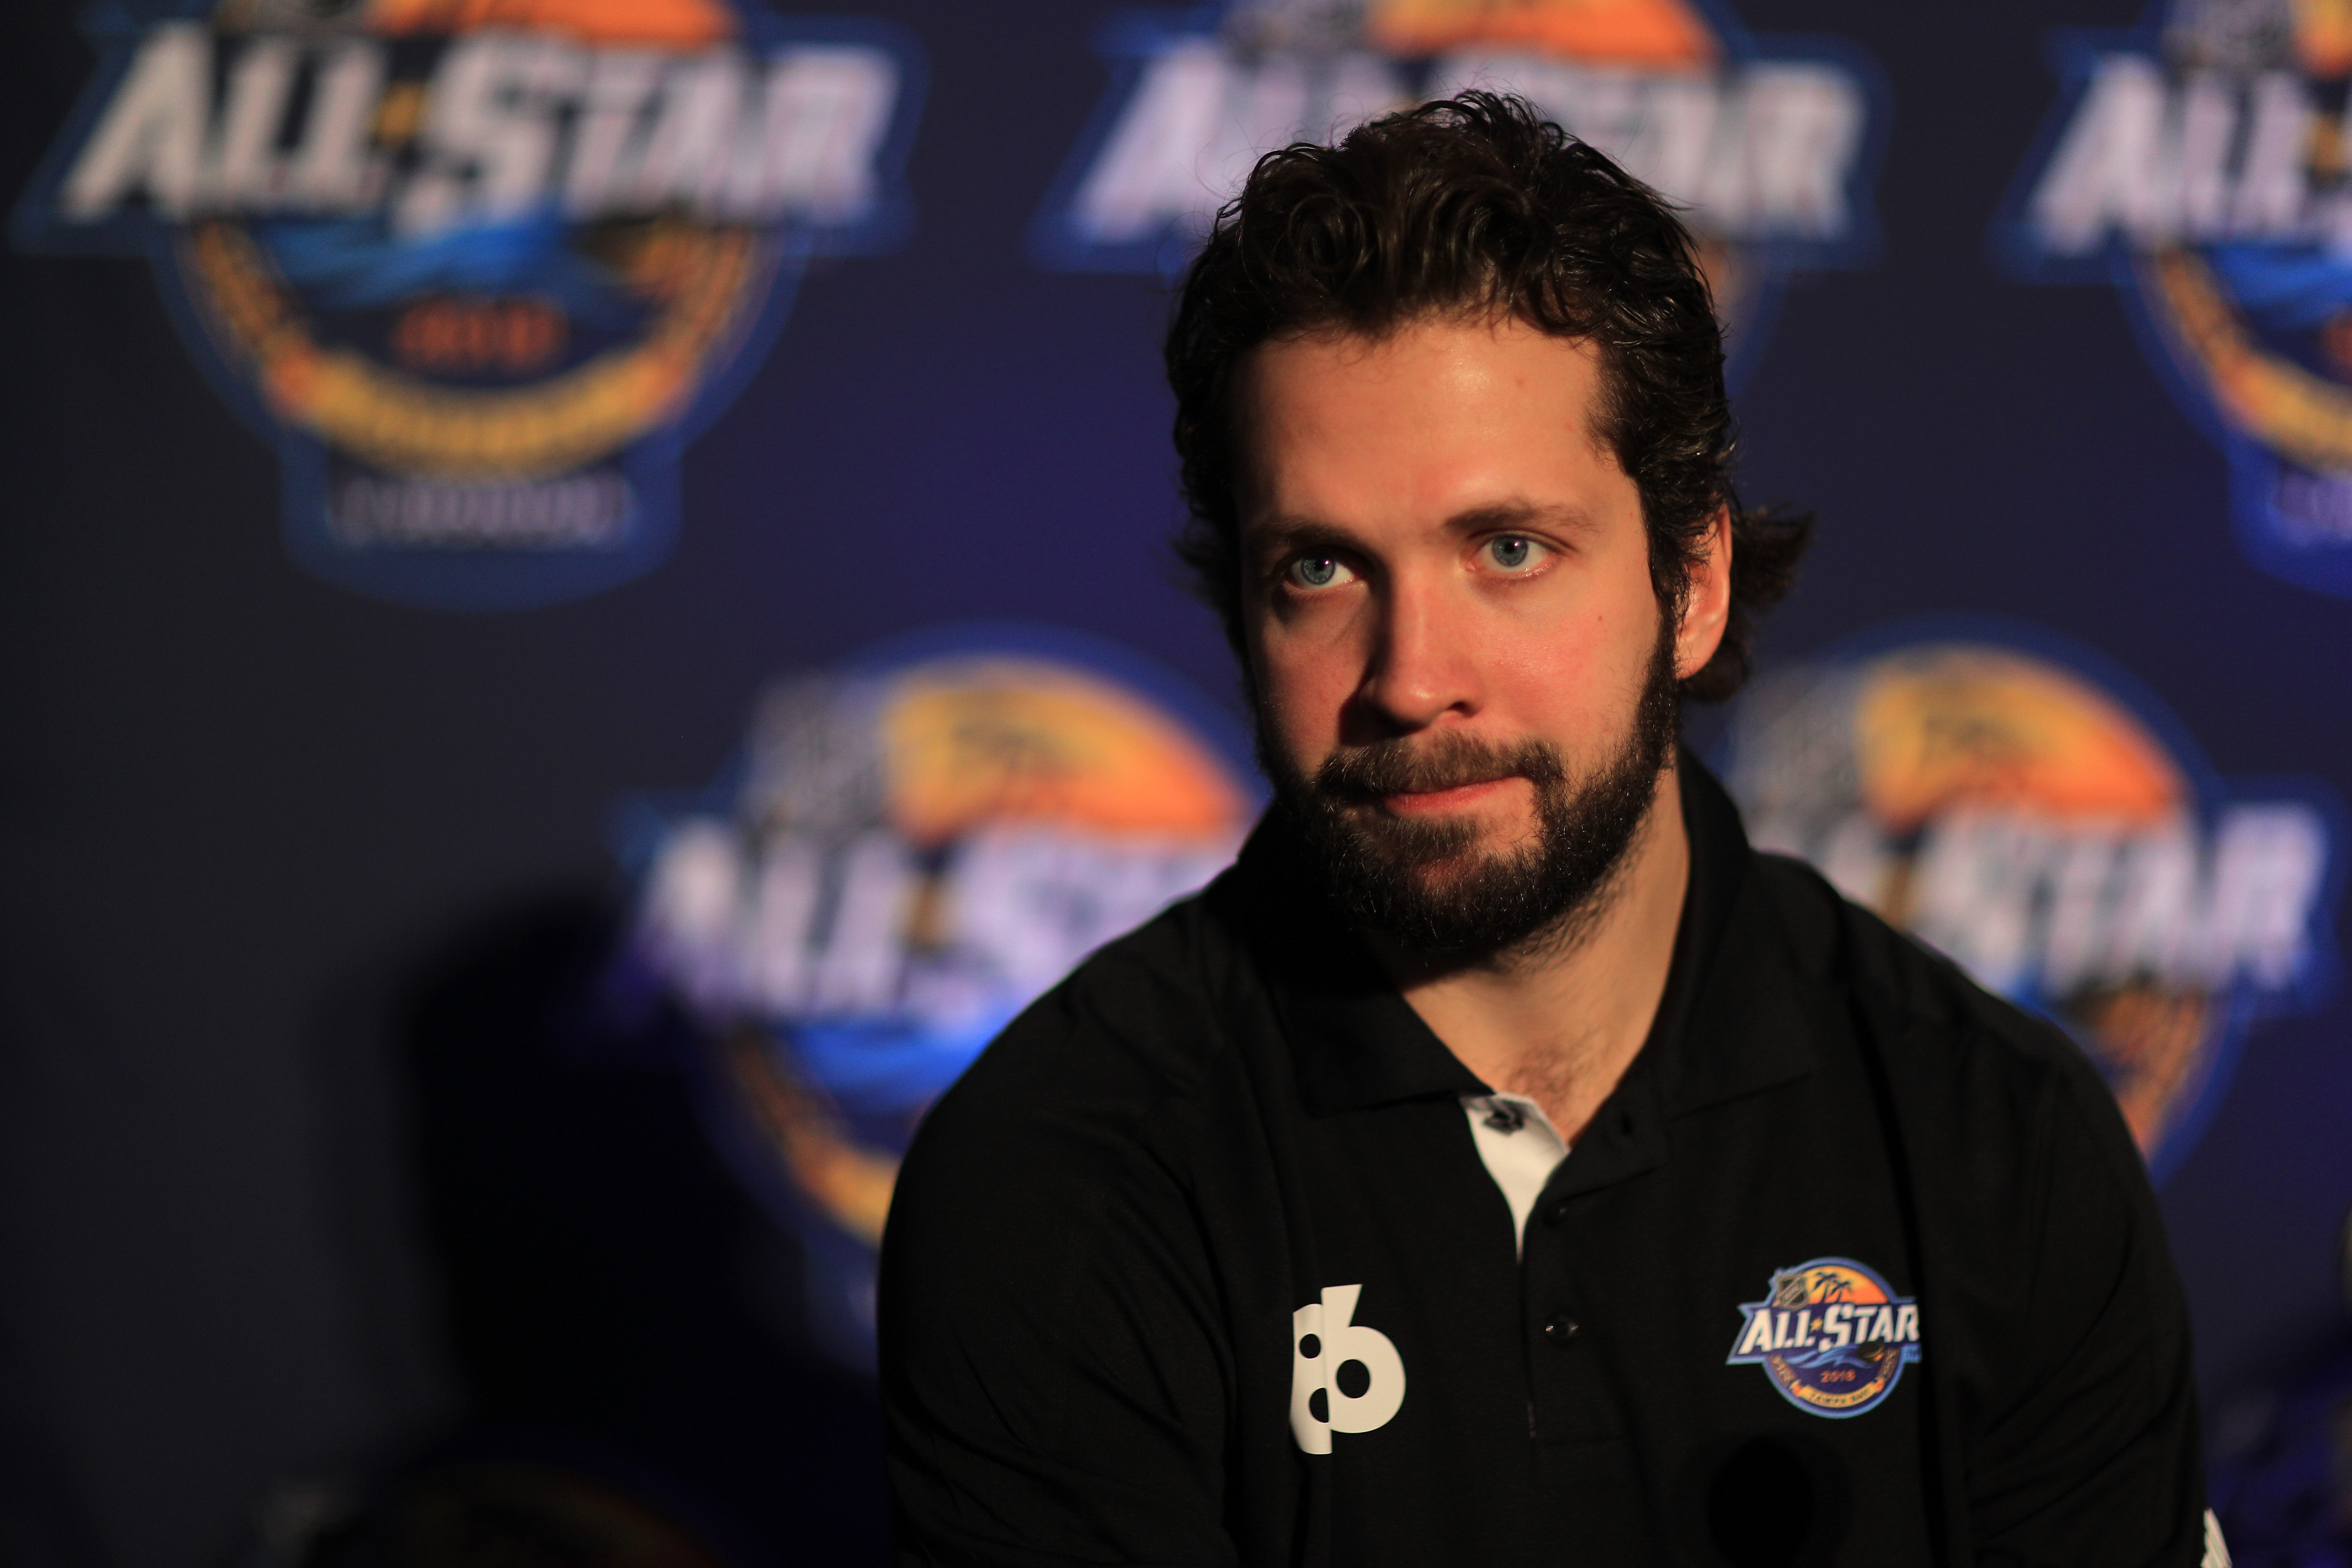 2018 NHL All-Star - Media Day